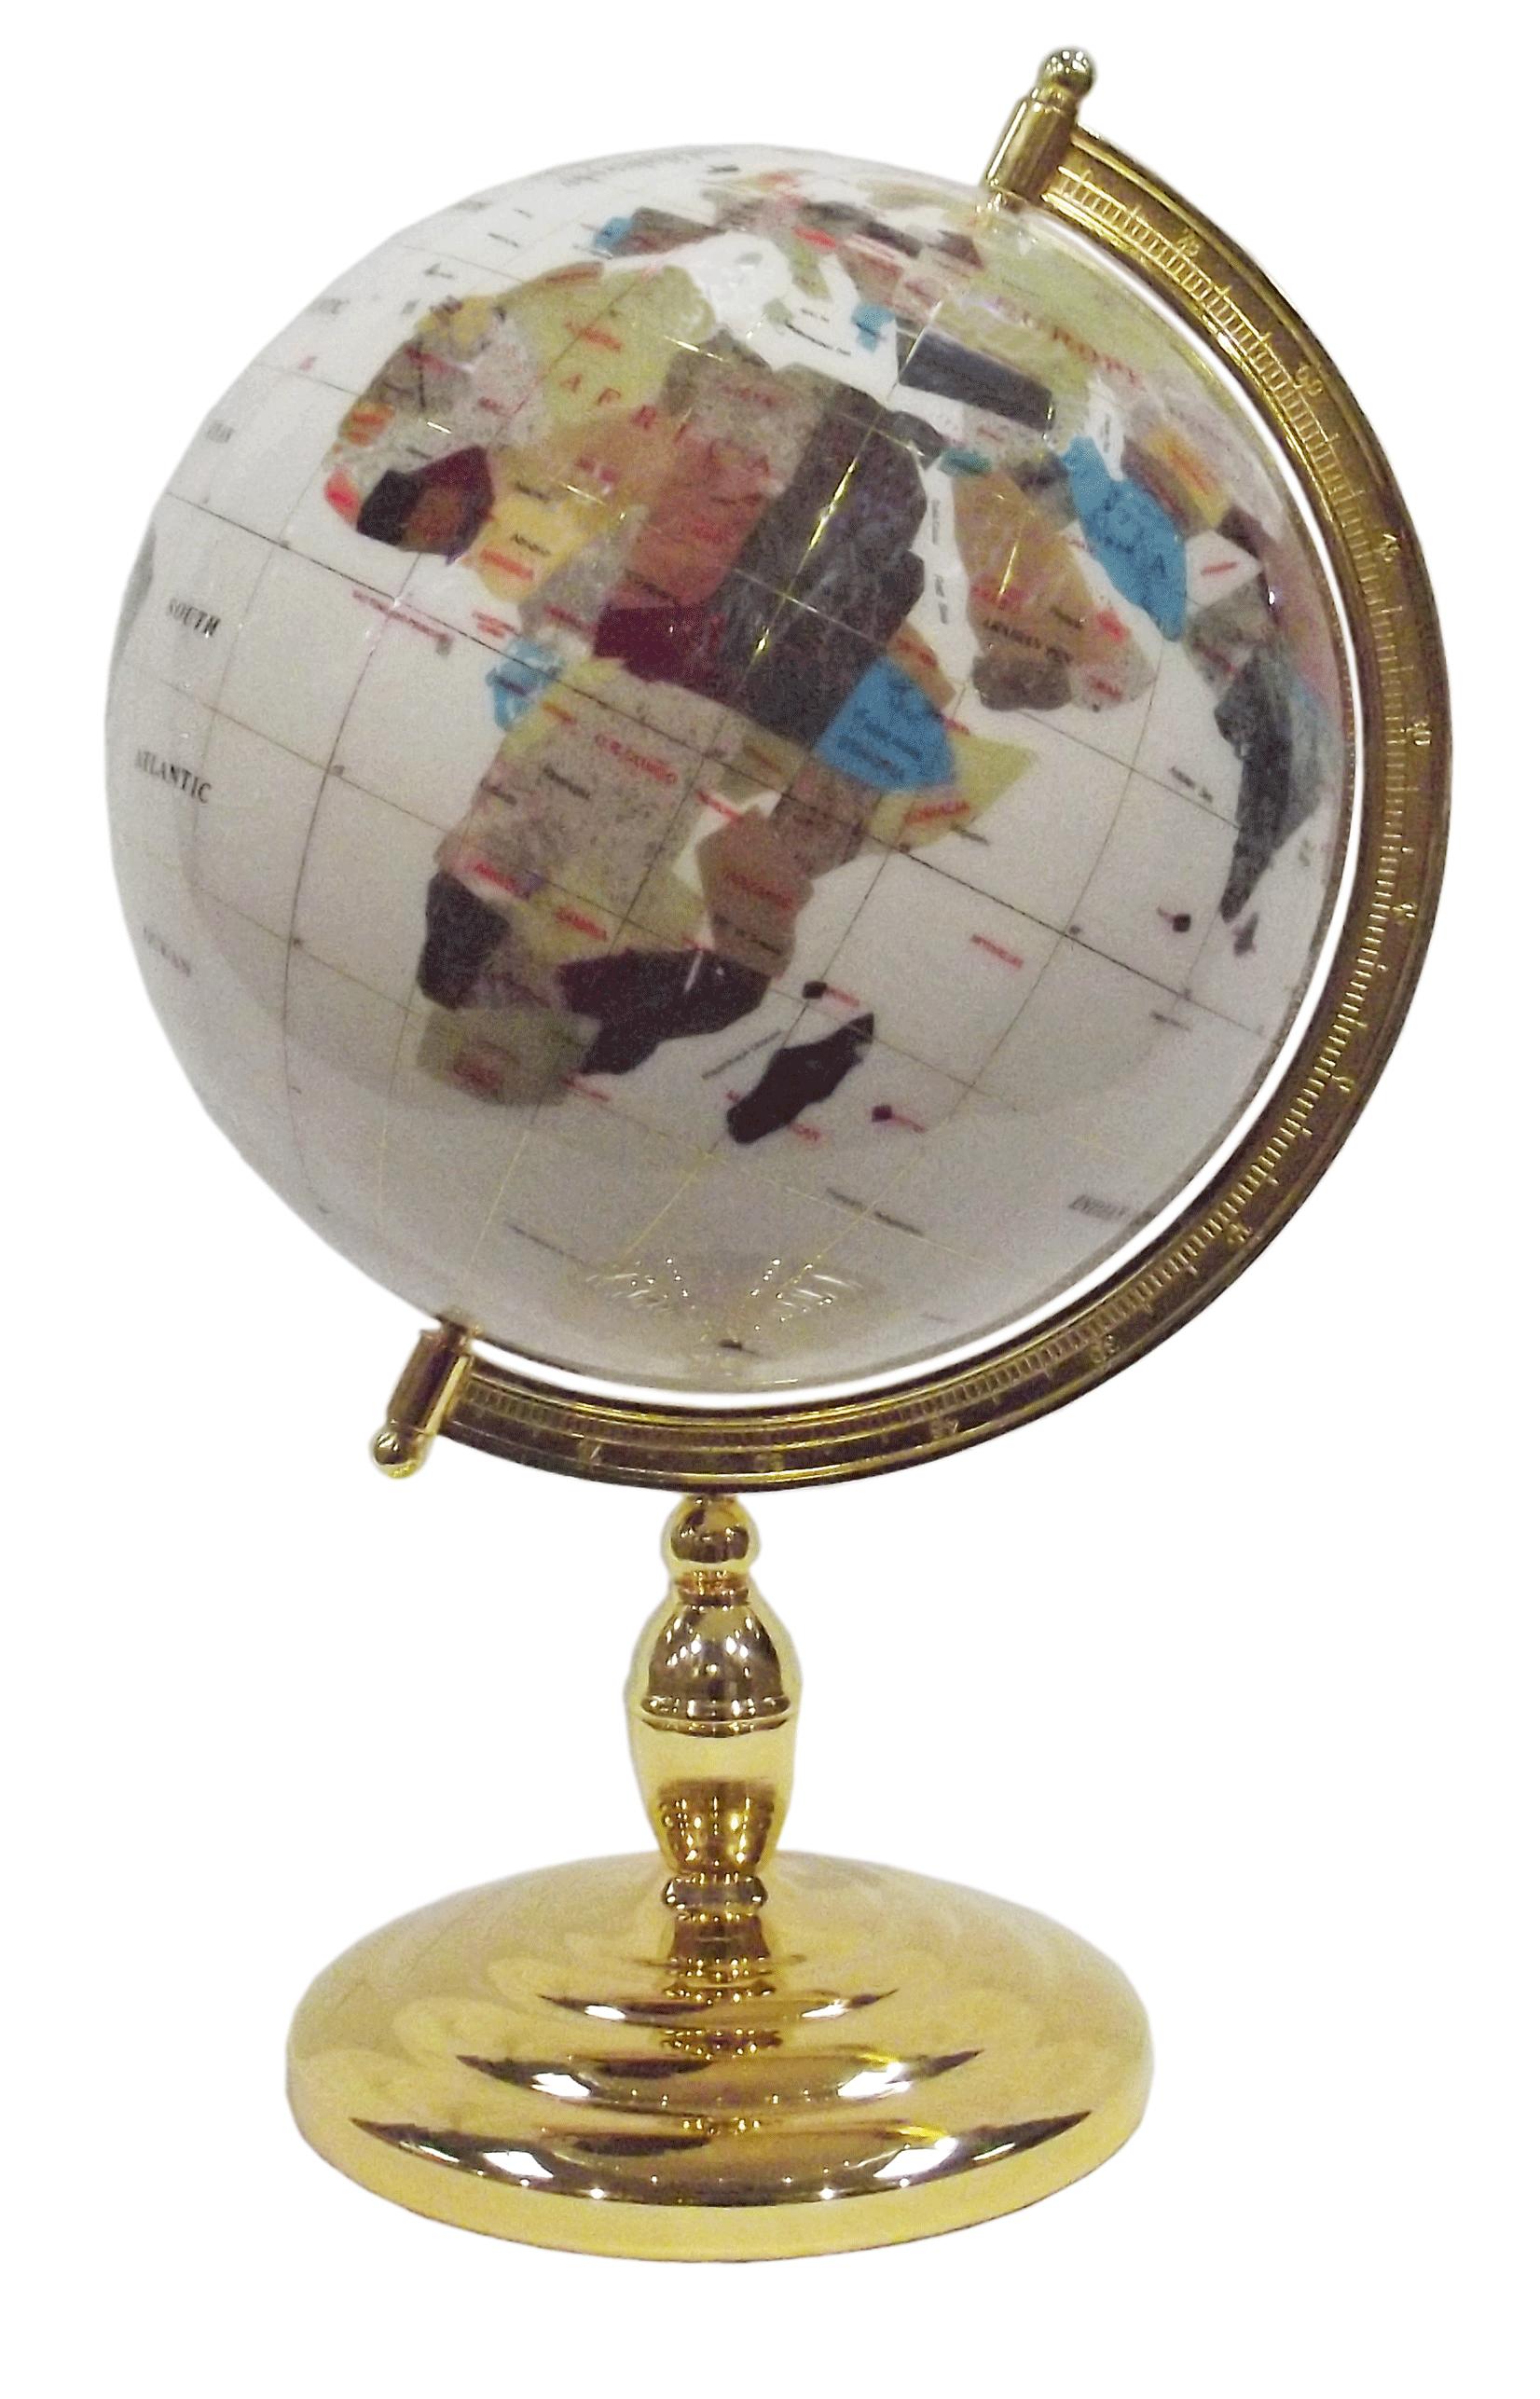 globe terrestre de bureau 33 cm blanc 1 pied dor gemmoglobe 1pb 33 d blan gemmoglobe. Black Bedroom Furniture Sets. Home Design Ideas